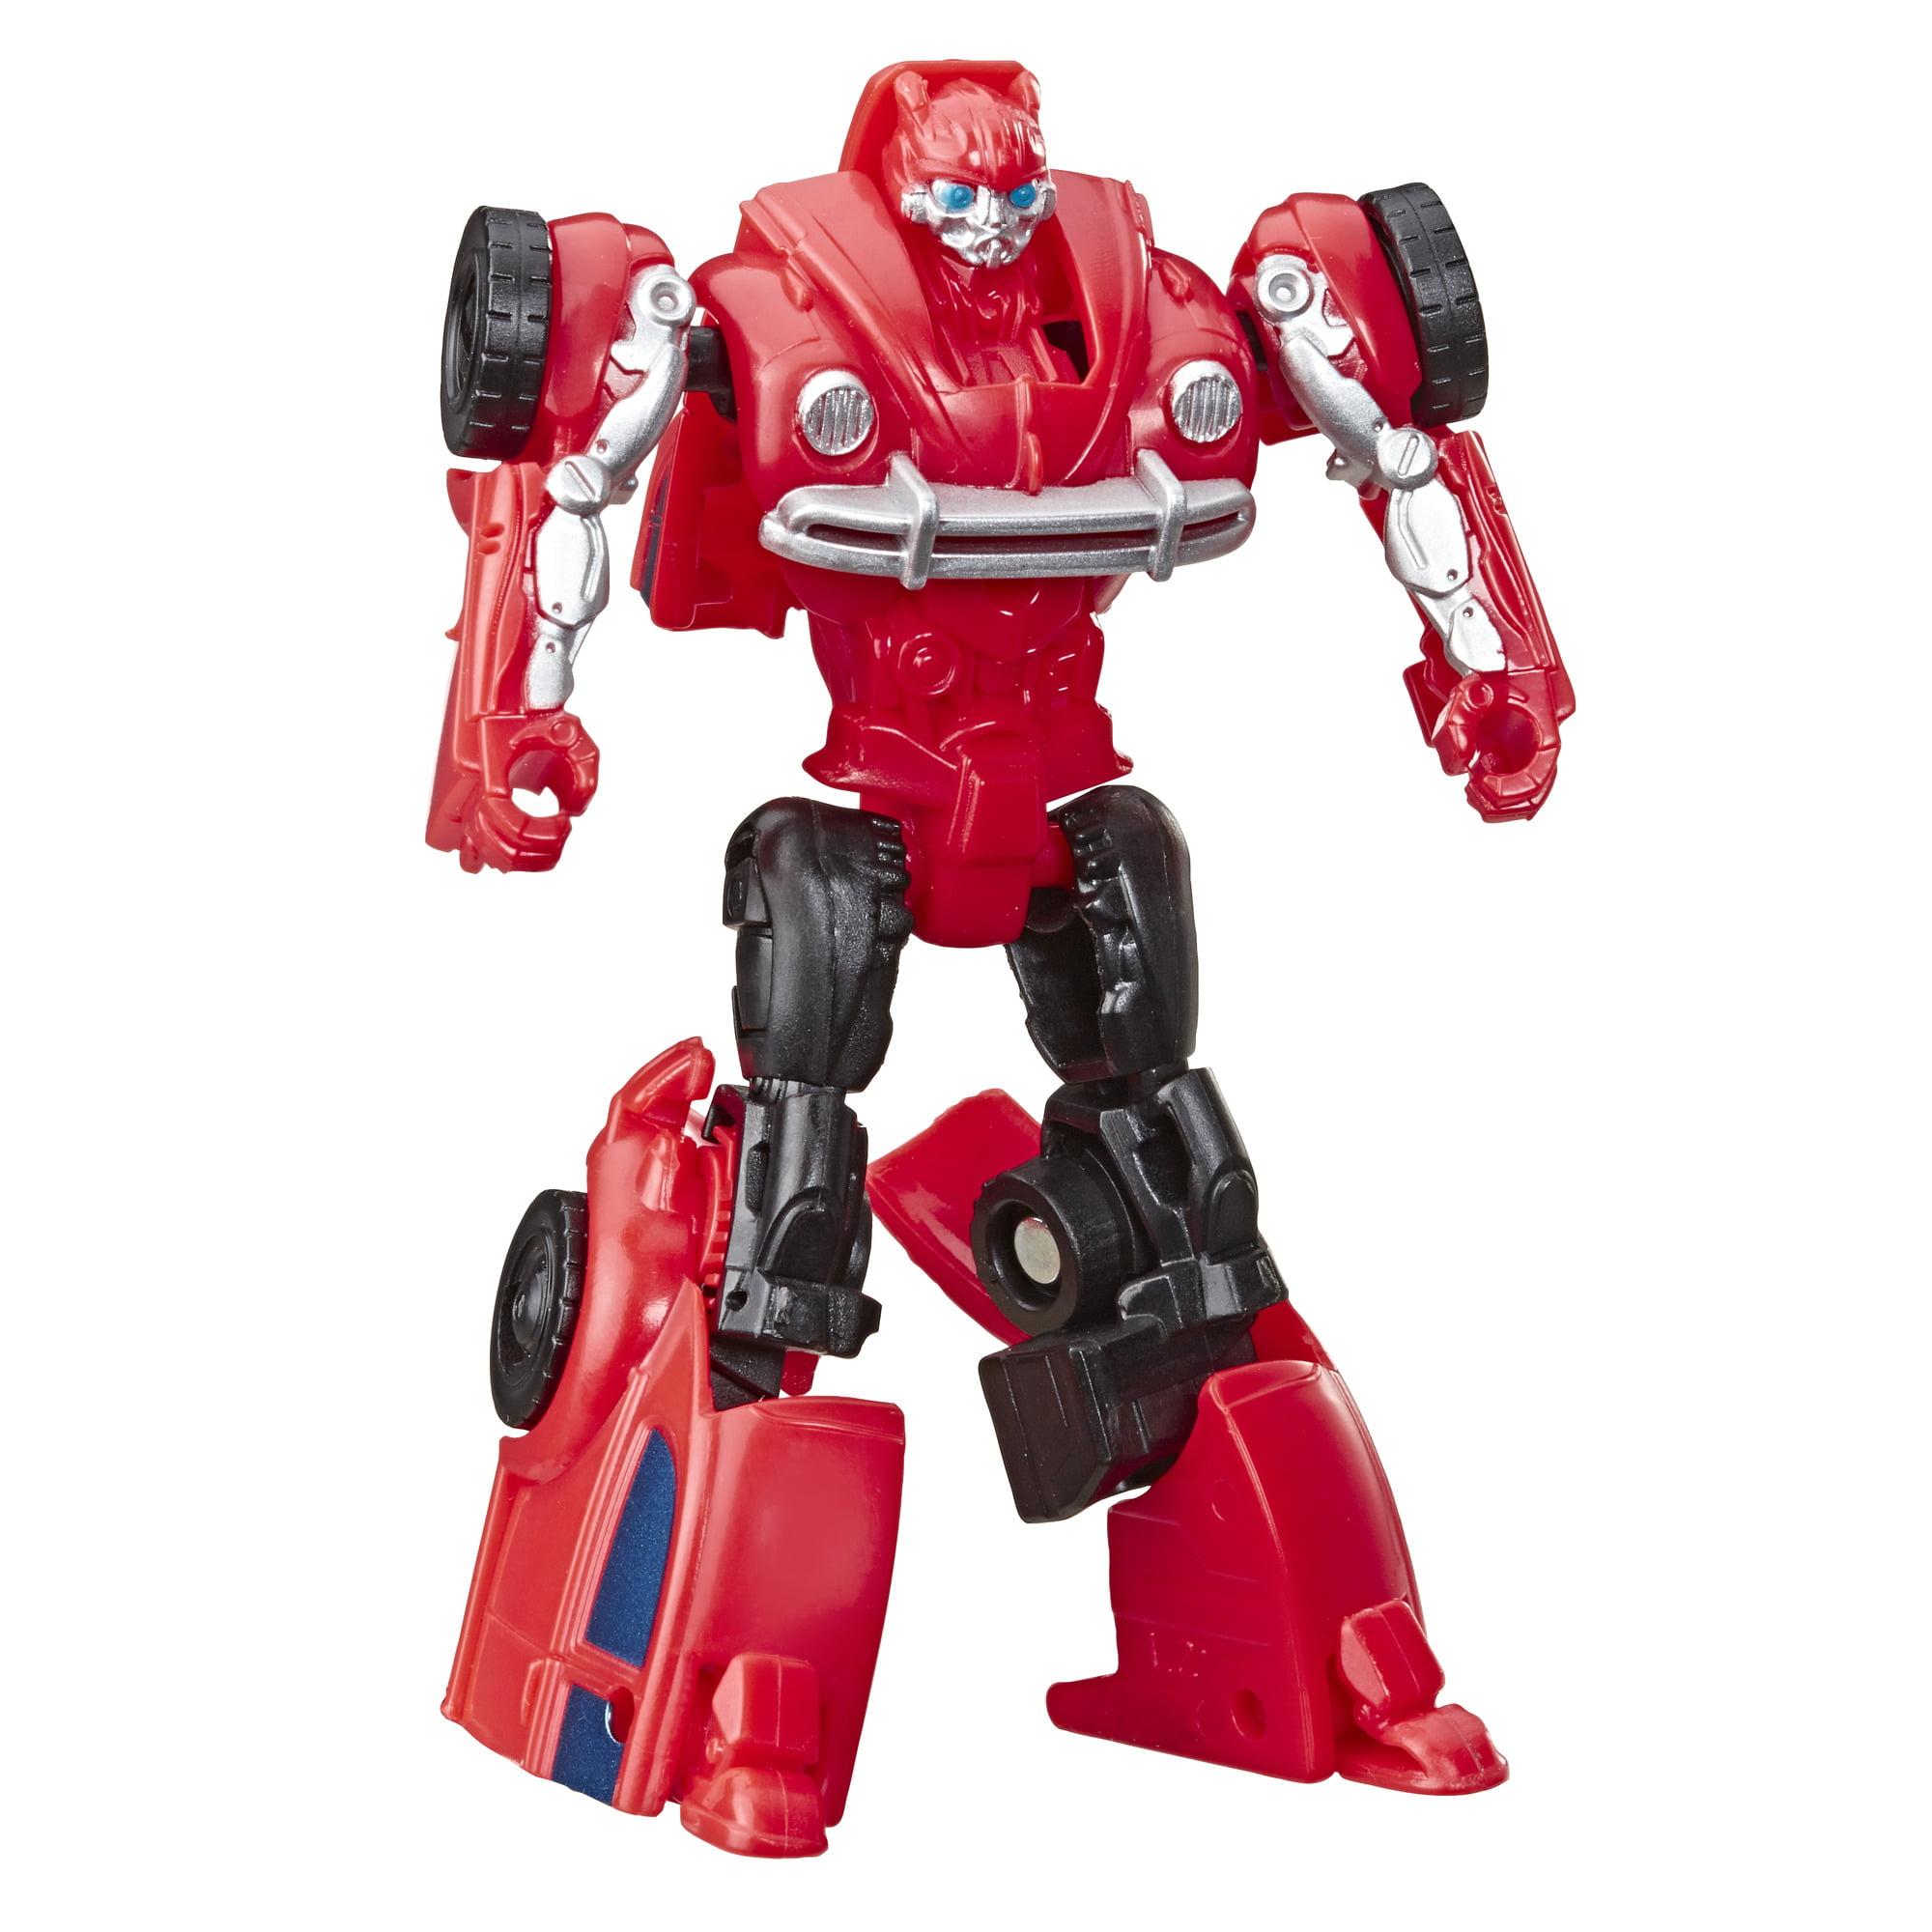 Transformers Bumblebee - Energon Igniters Speed Series Cliffjumper Action Figure